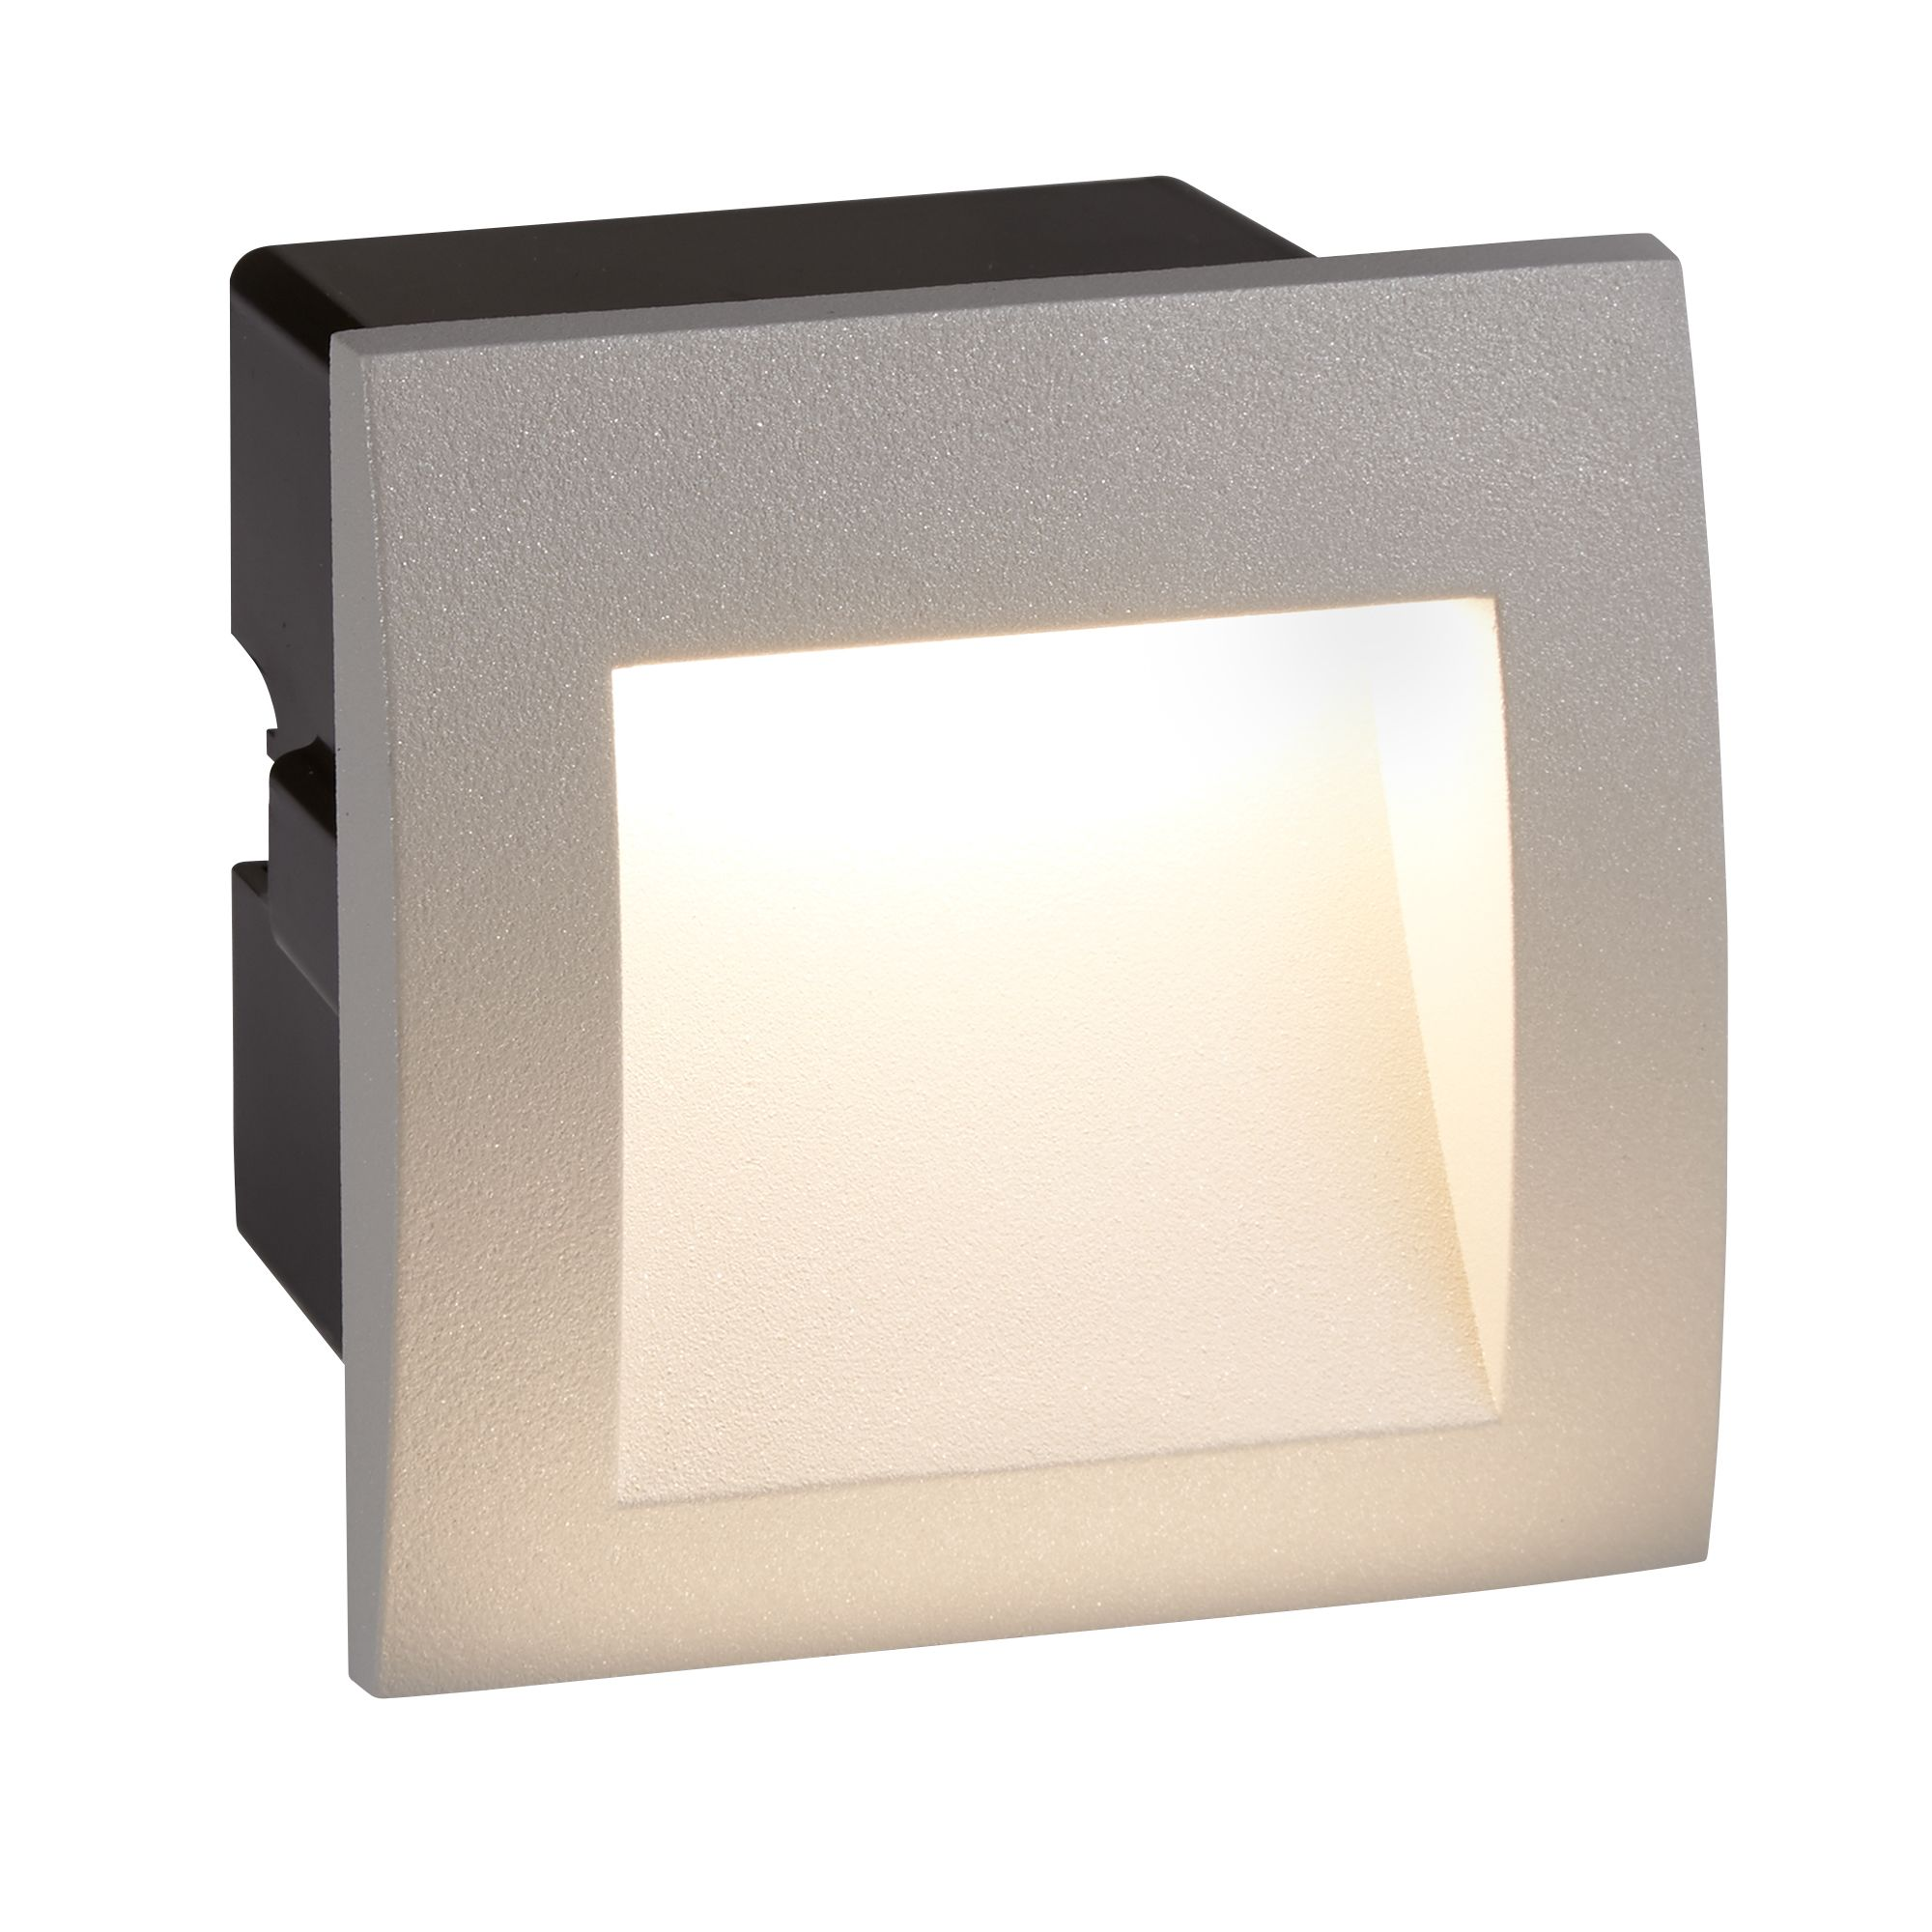 Searchlight Ankle beépíthető lámpa